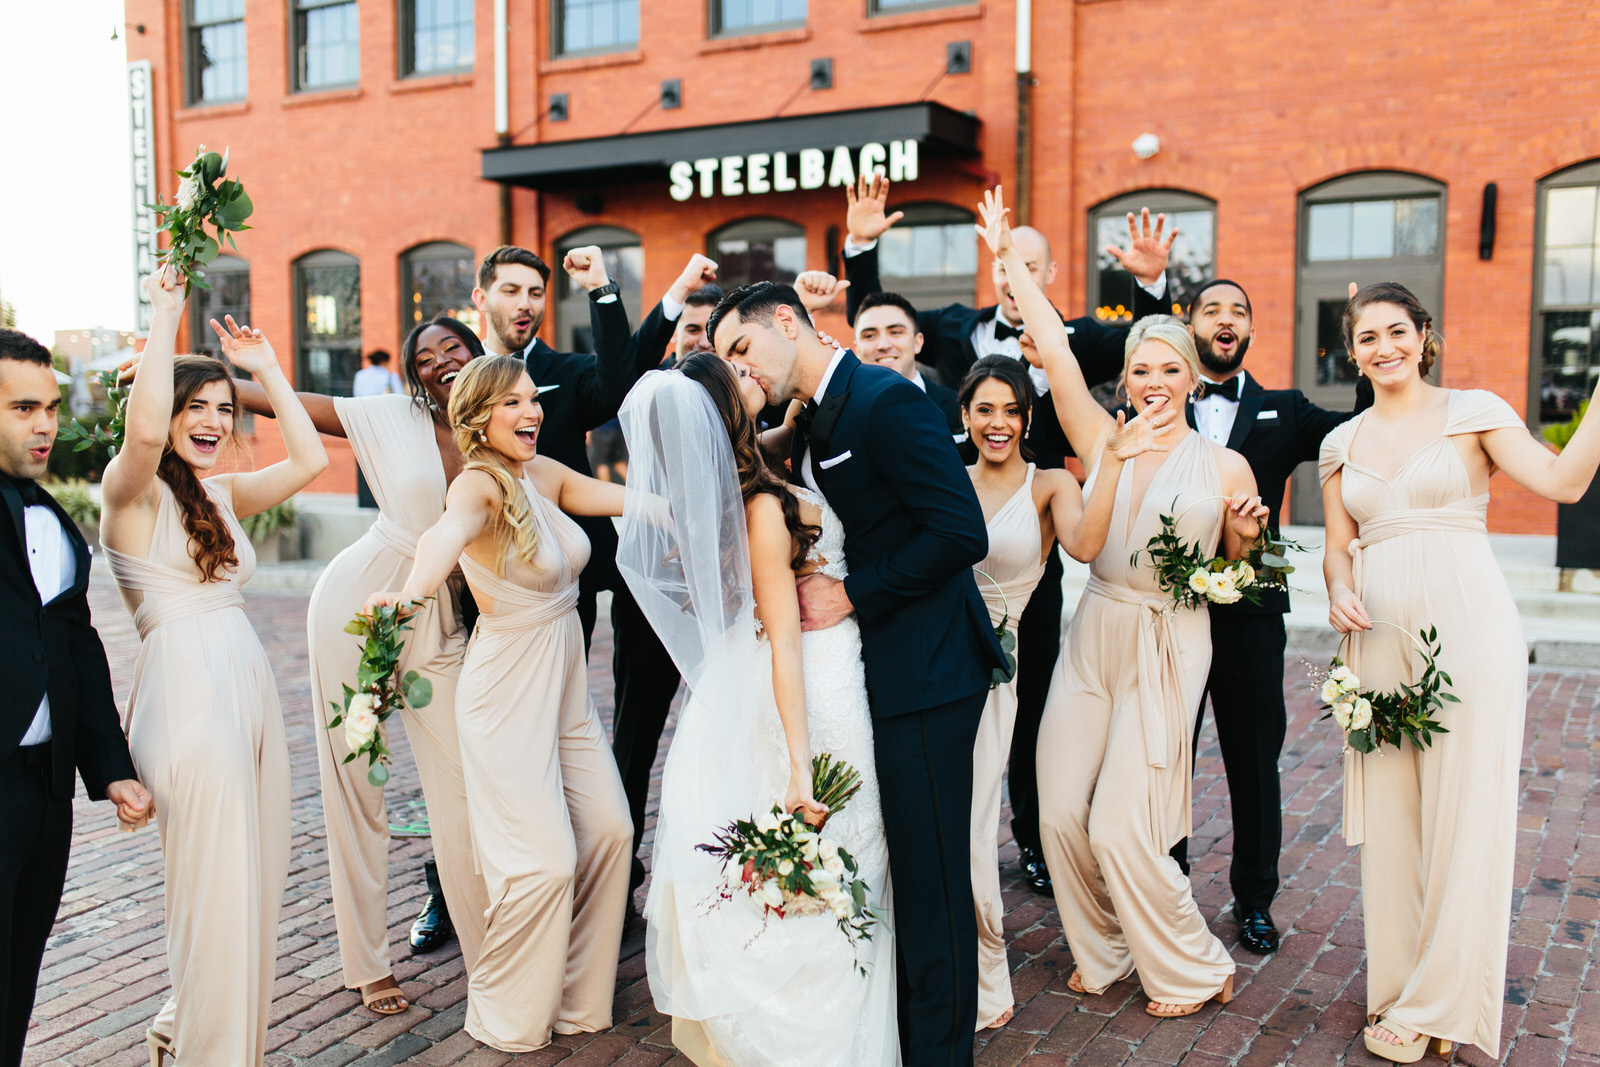 Bridal Party Cheering Bride and Groom Kiss